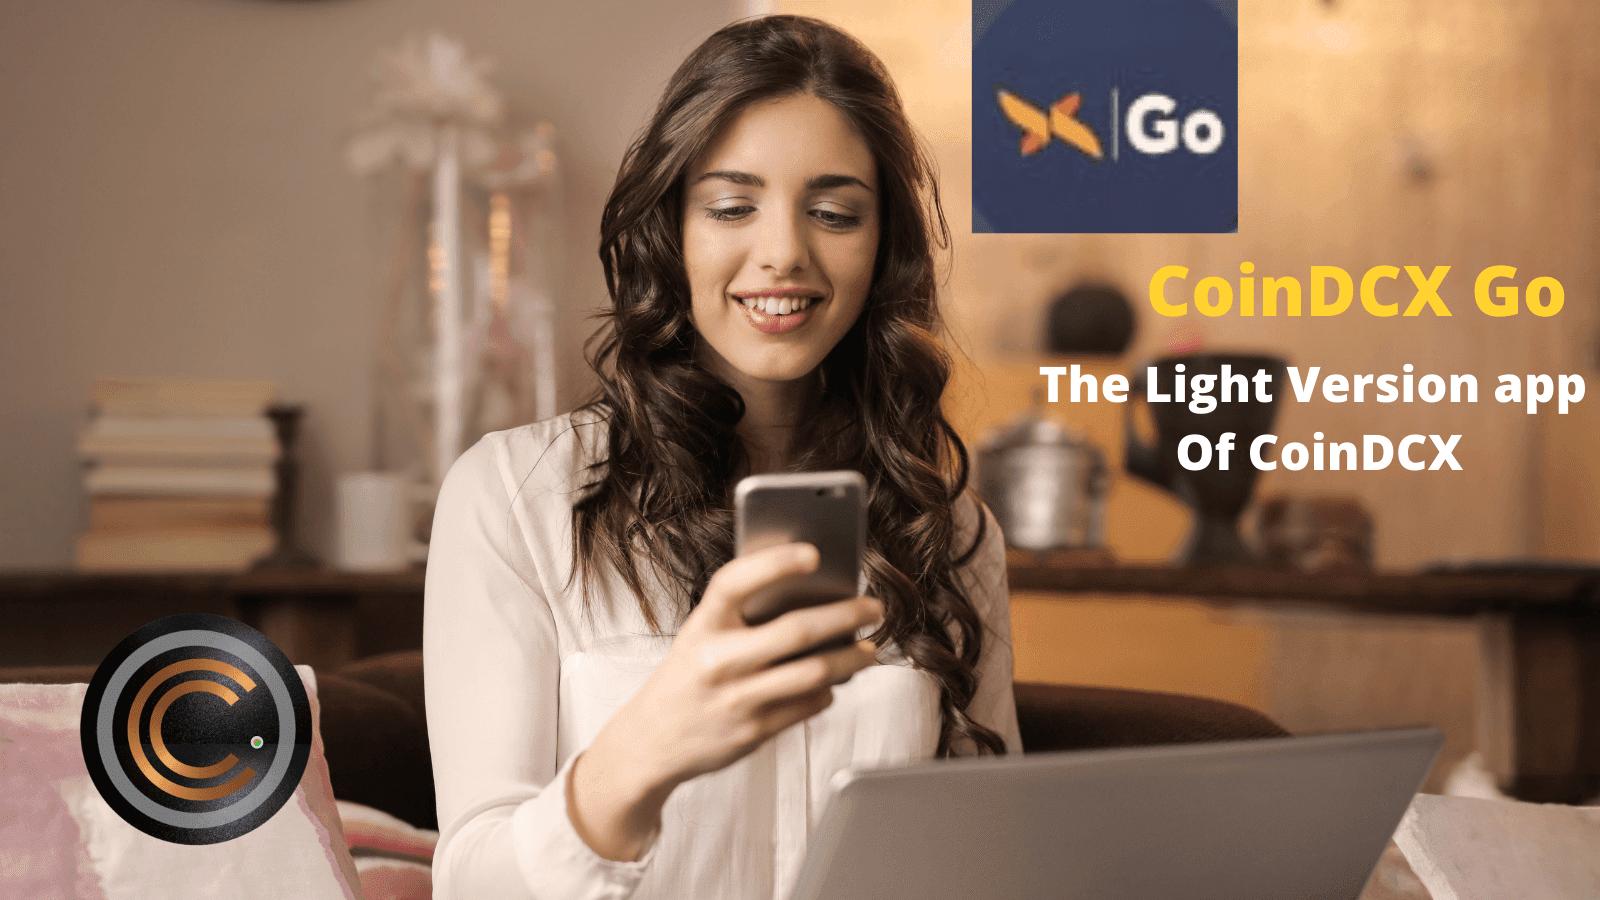 CoinDCX Go: - Light version application of CoinDCX